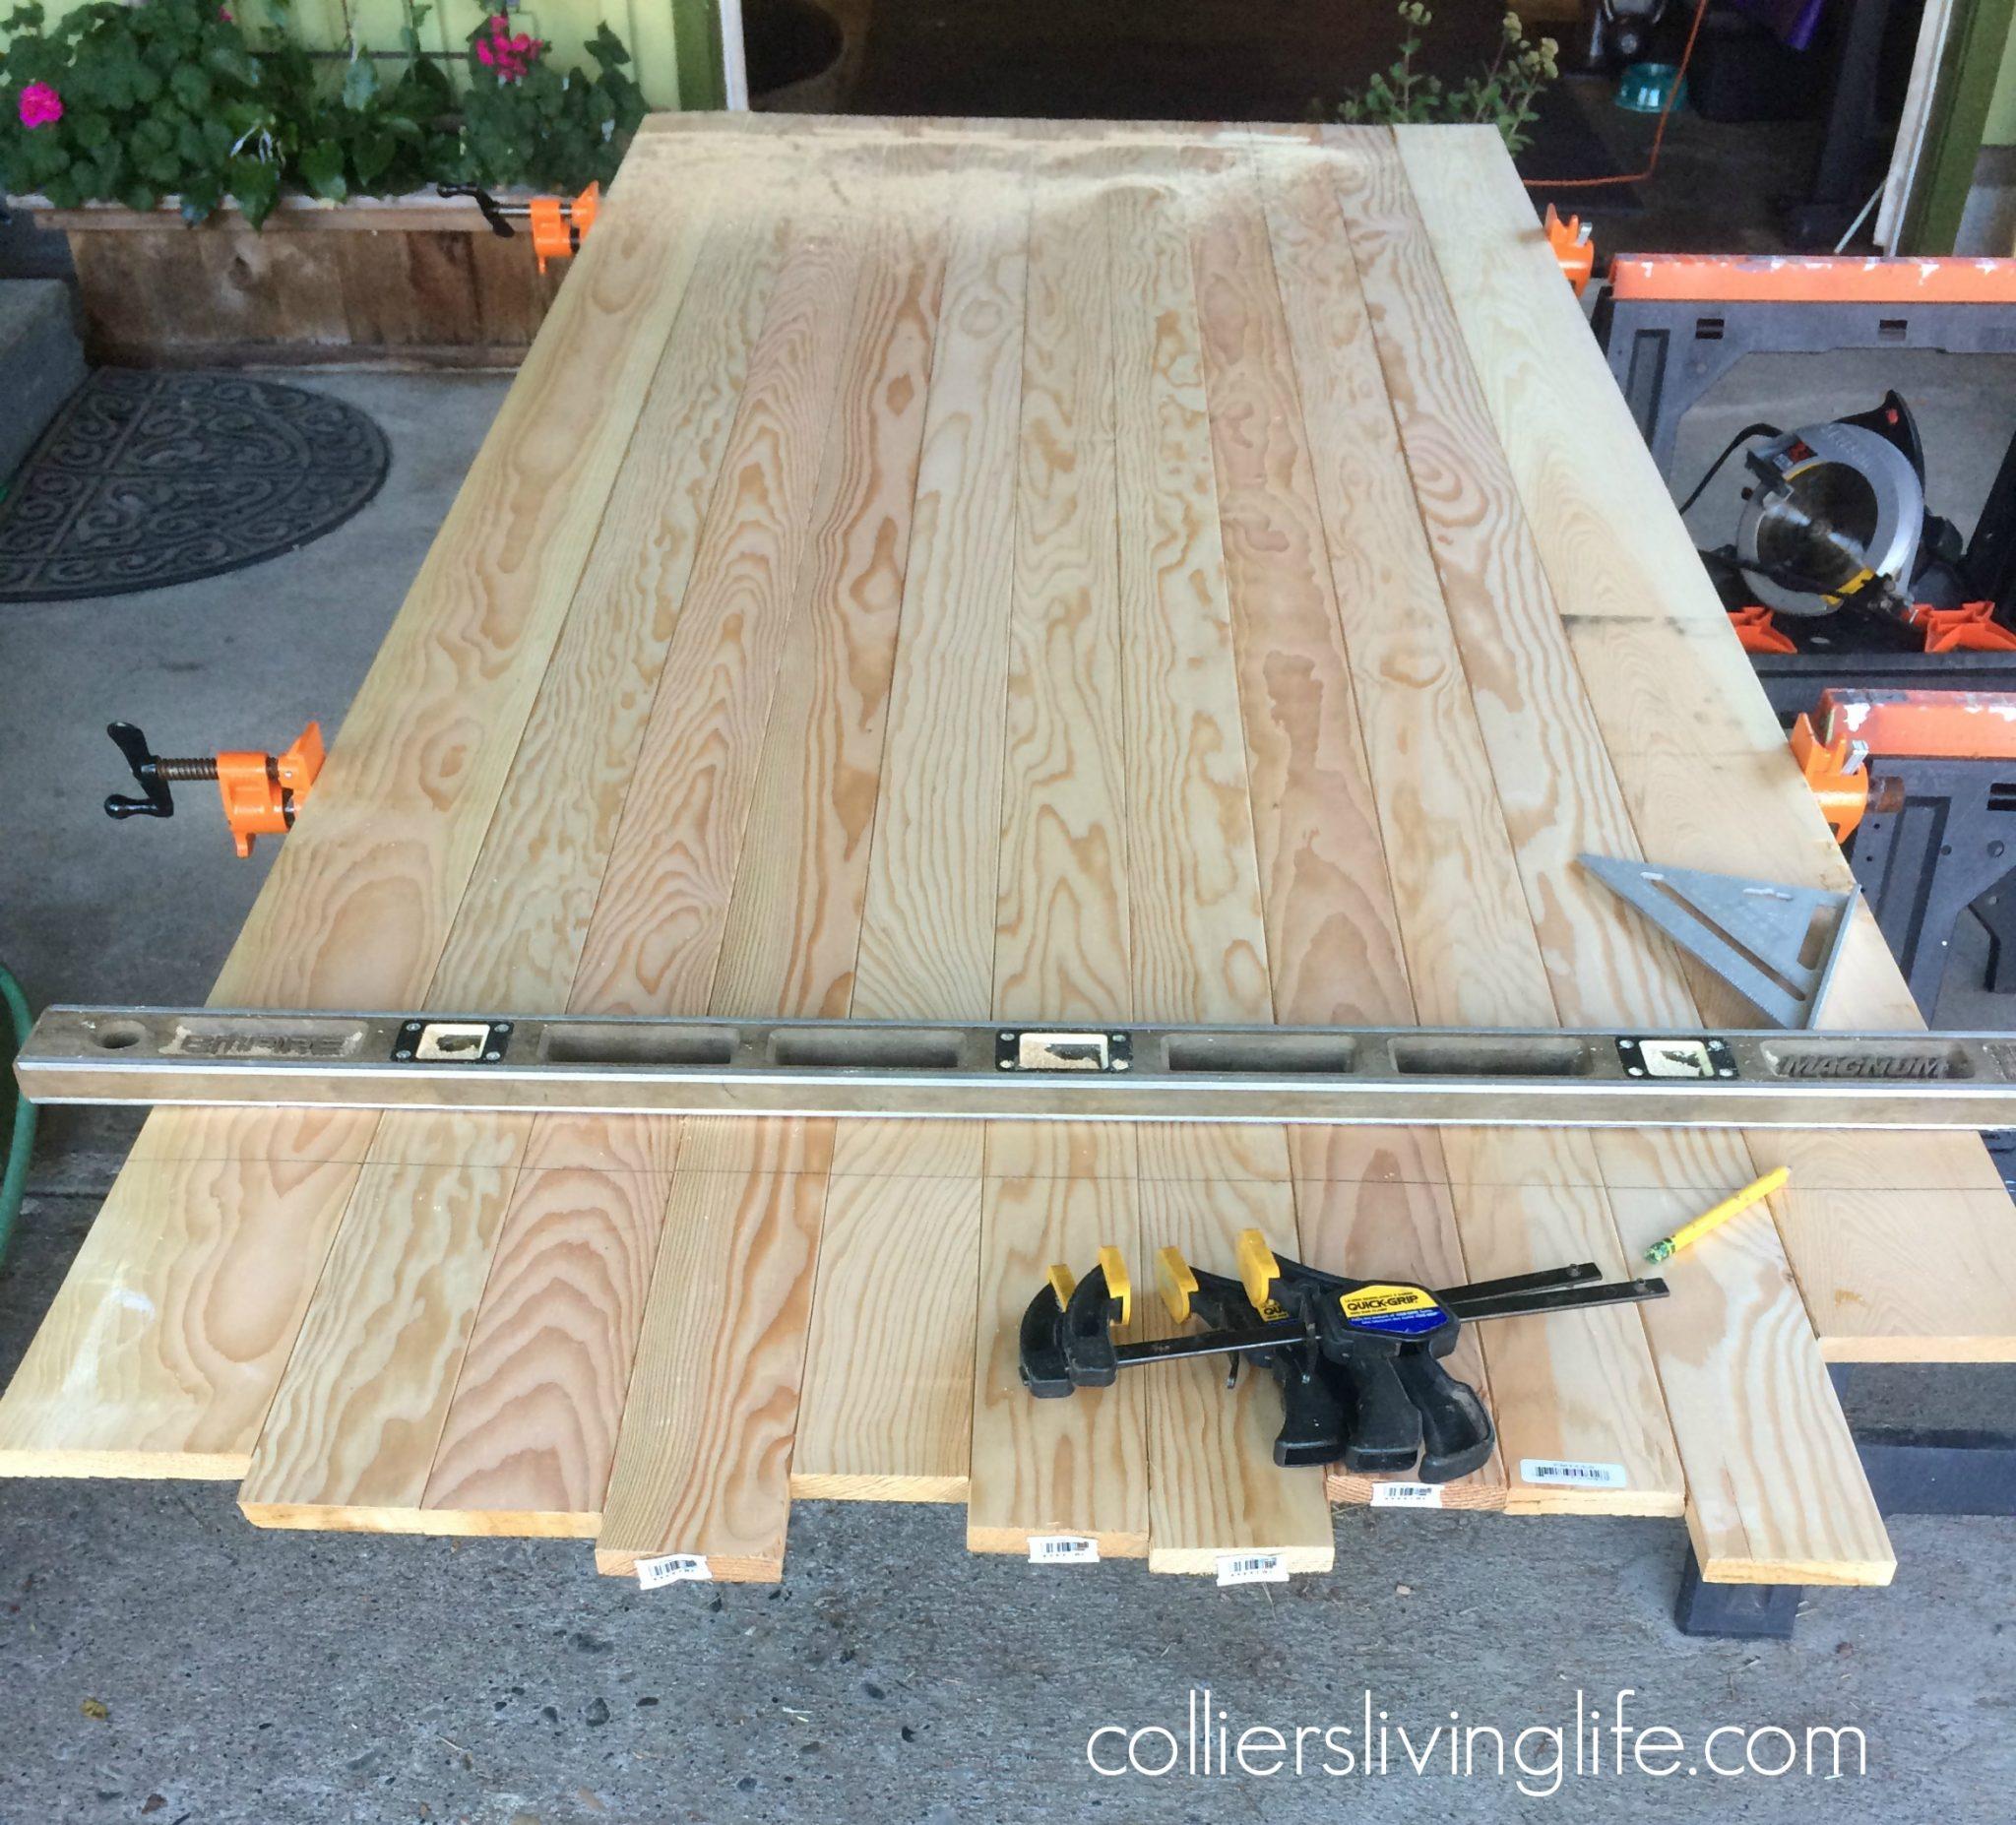 Building Sliding Barn Door Diy: Easy To Build With Easy To Follow